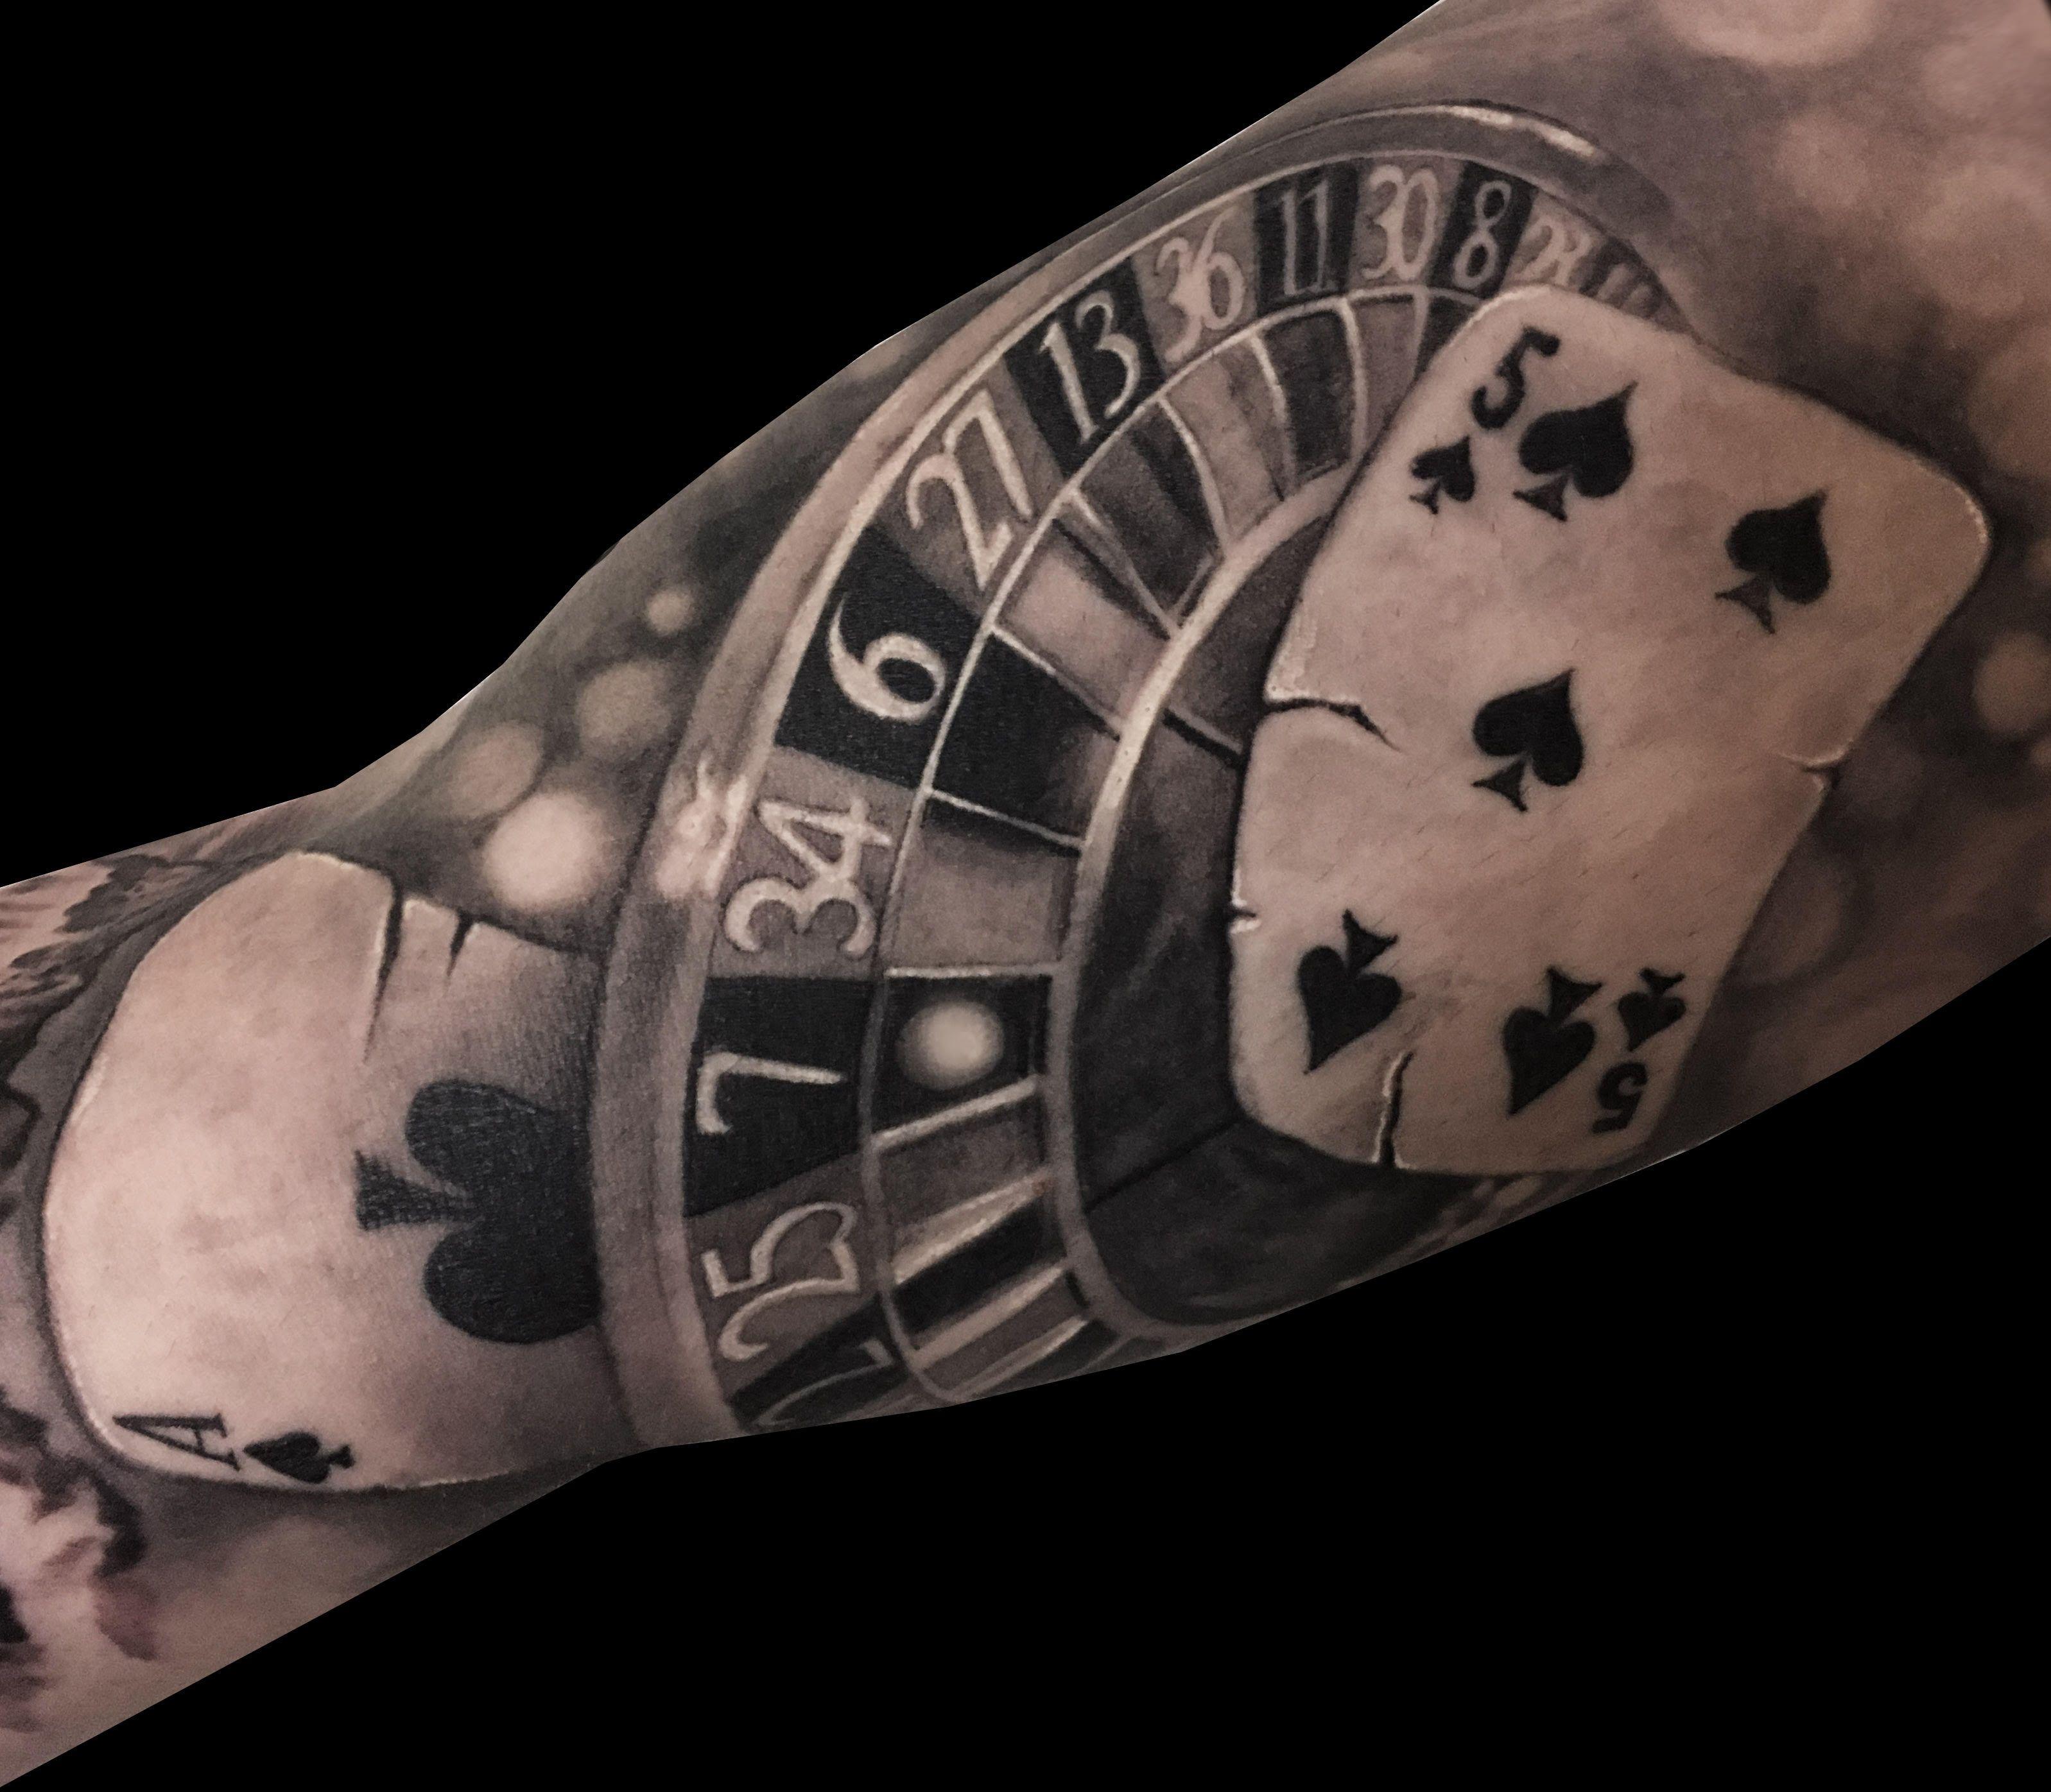 Pin De نشجف چققق En Pp Tatuaje Tatuajes De Poker Tatuajes Brazo